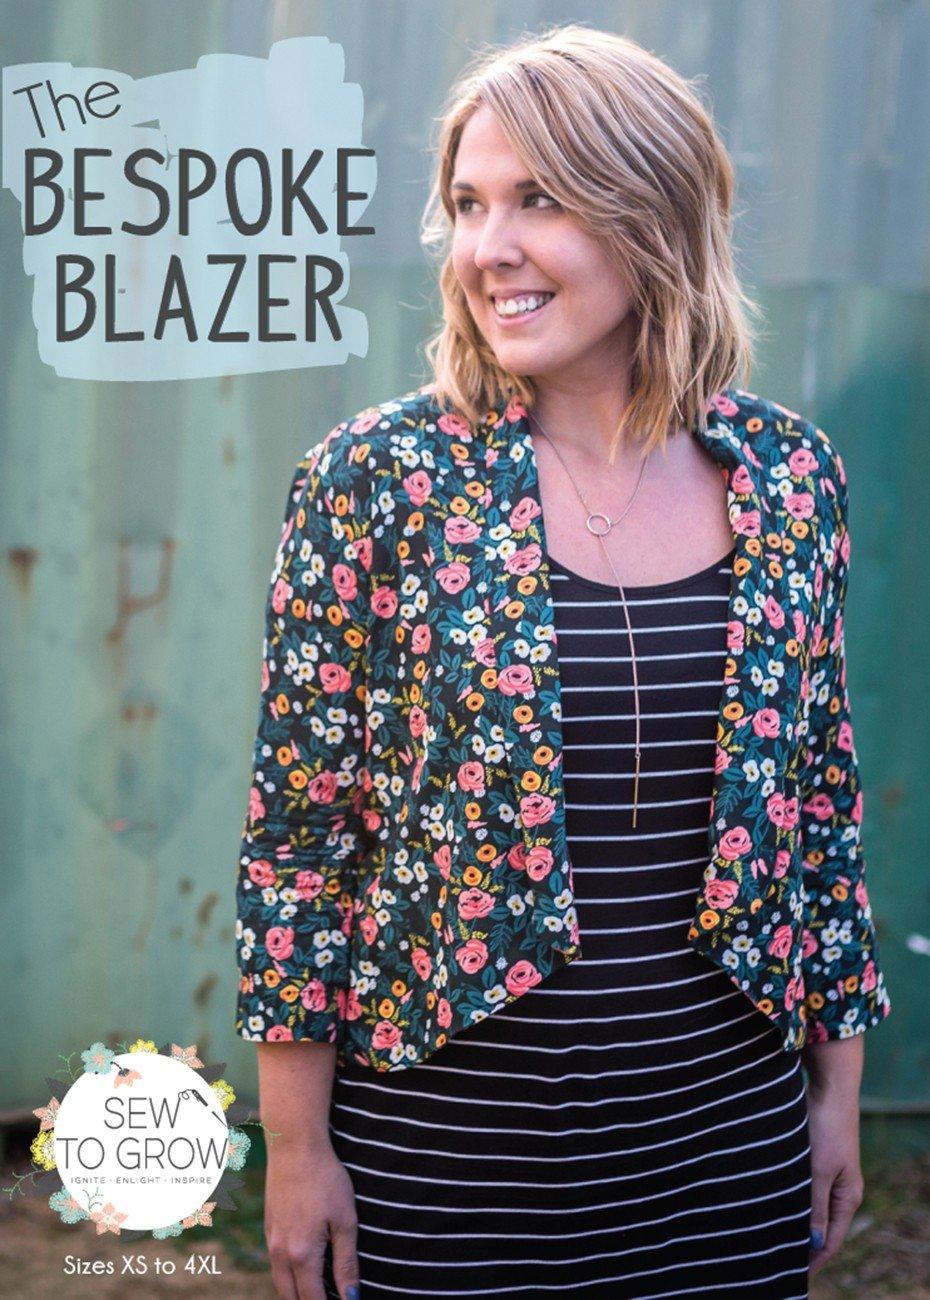 The Bespoke Blazer